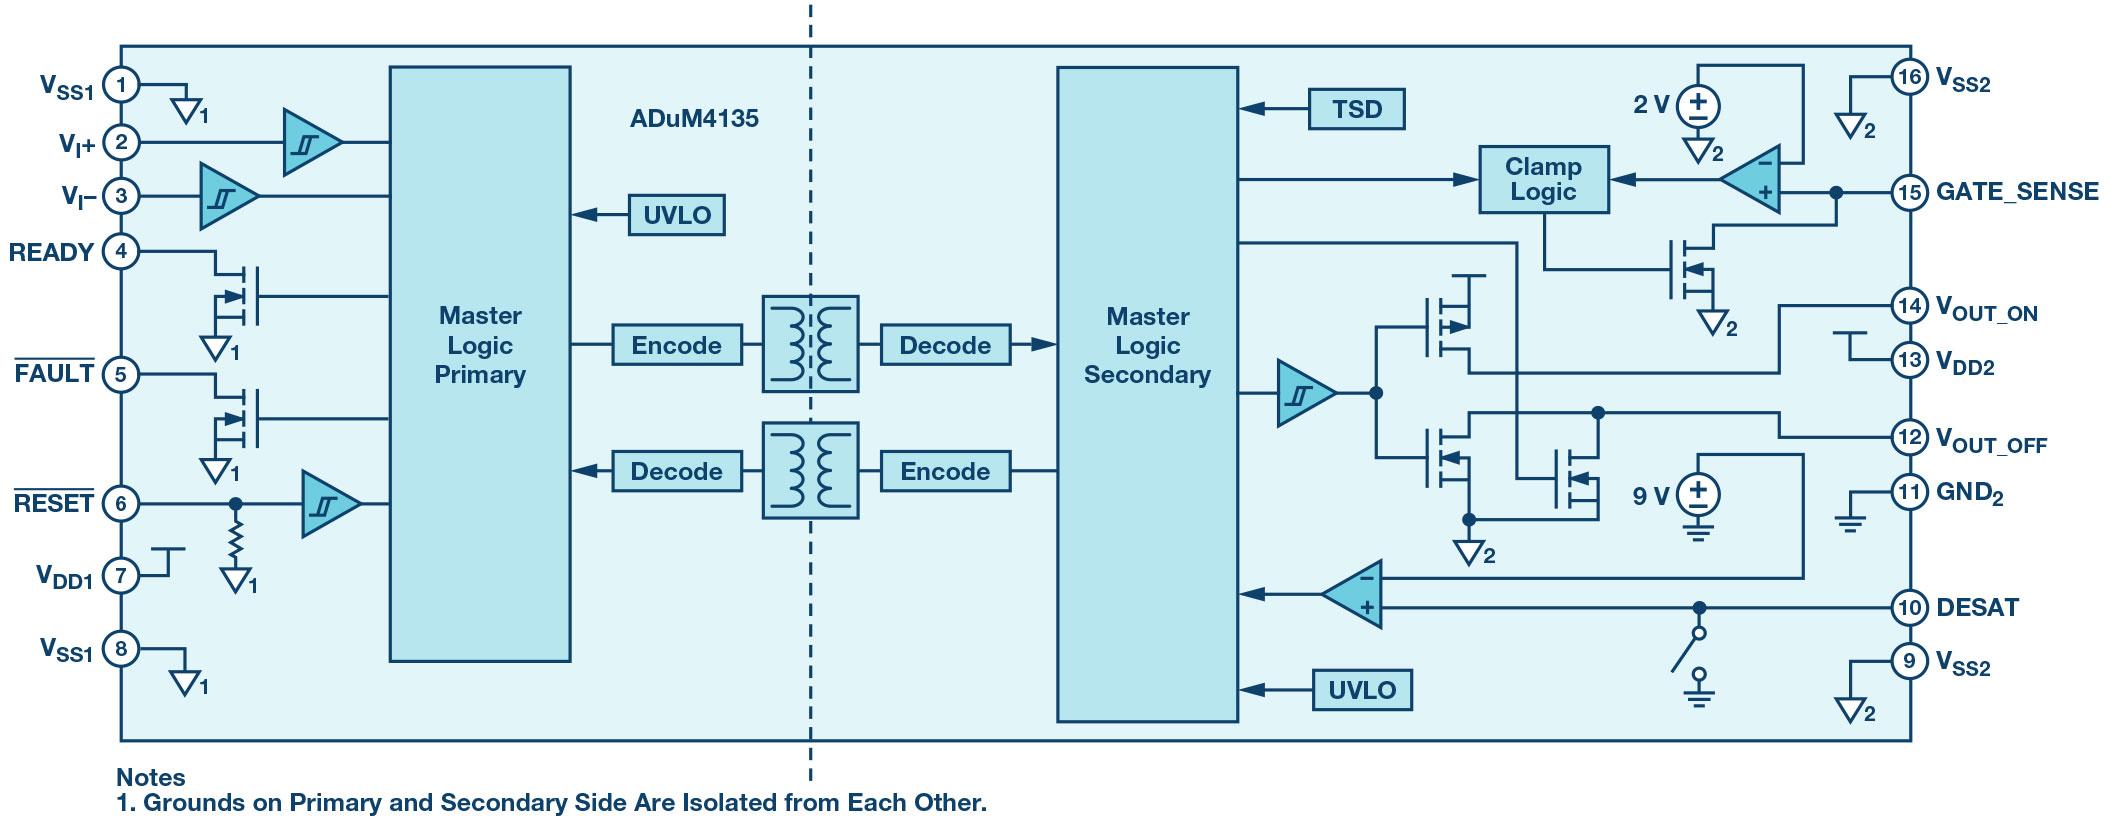 hight resolution of adum4135 block diagram